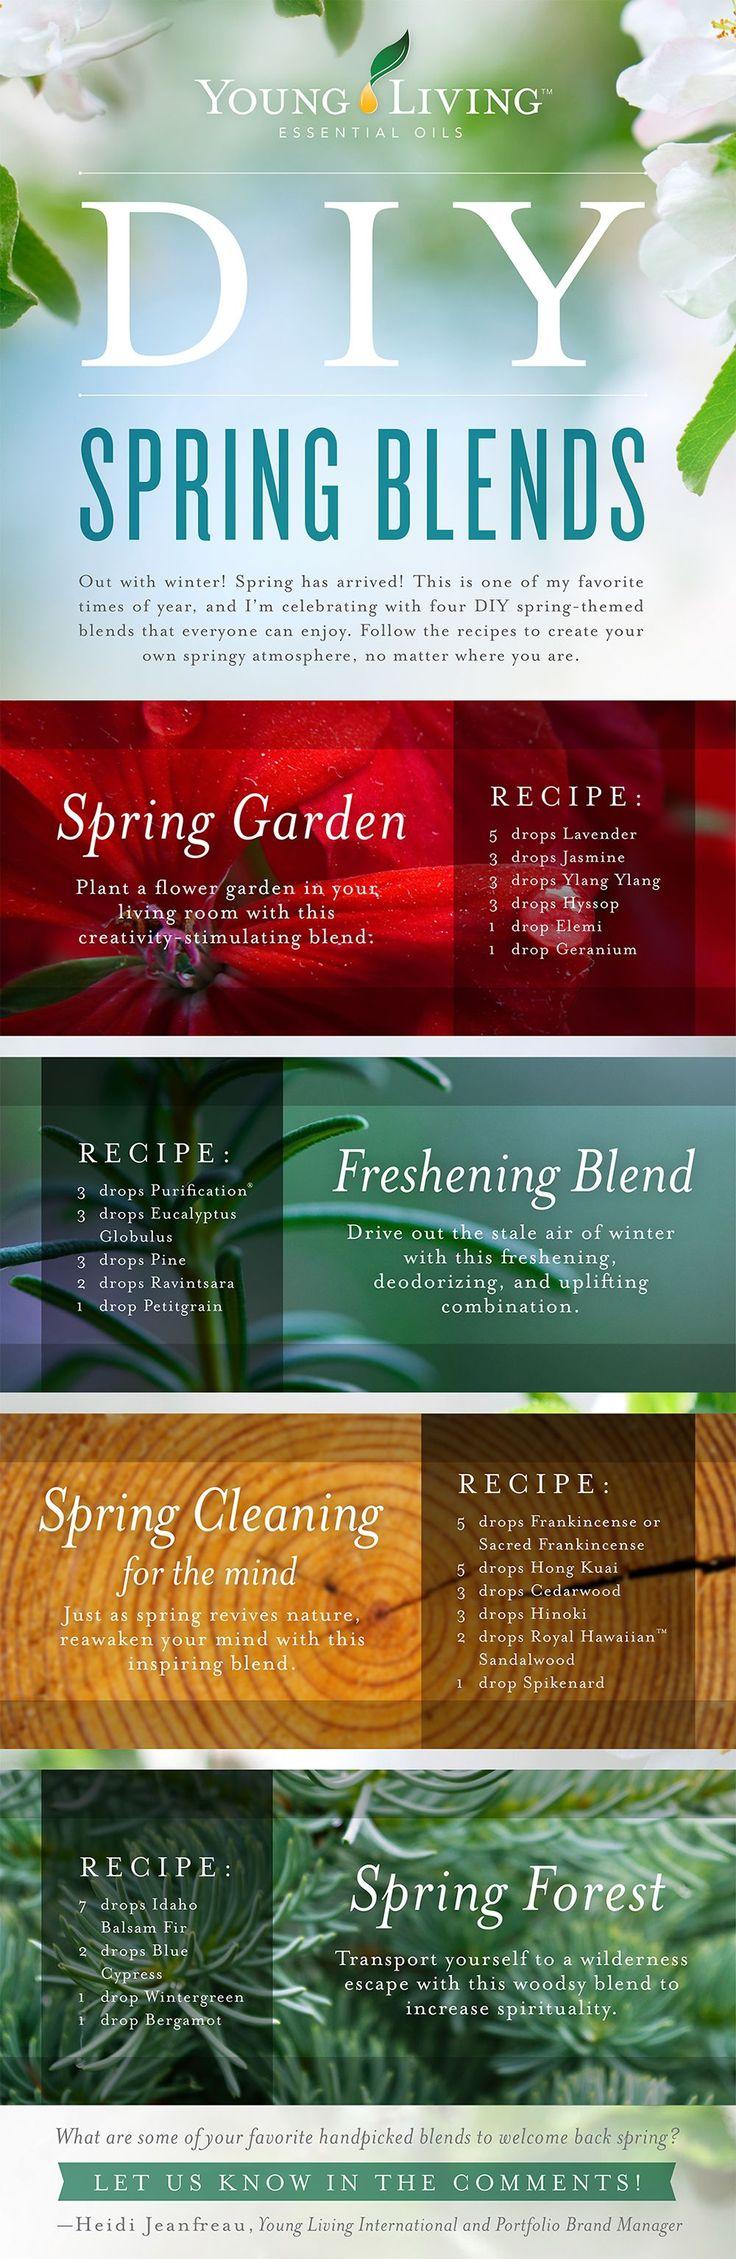 DIY Spring Essential Oil Diffuser Blends